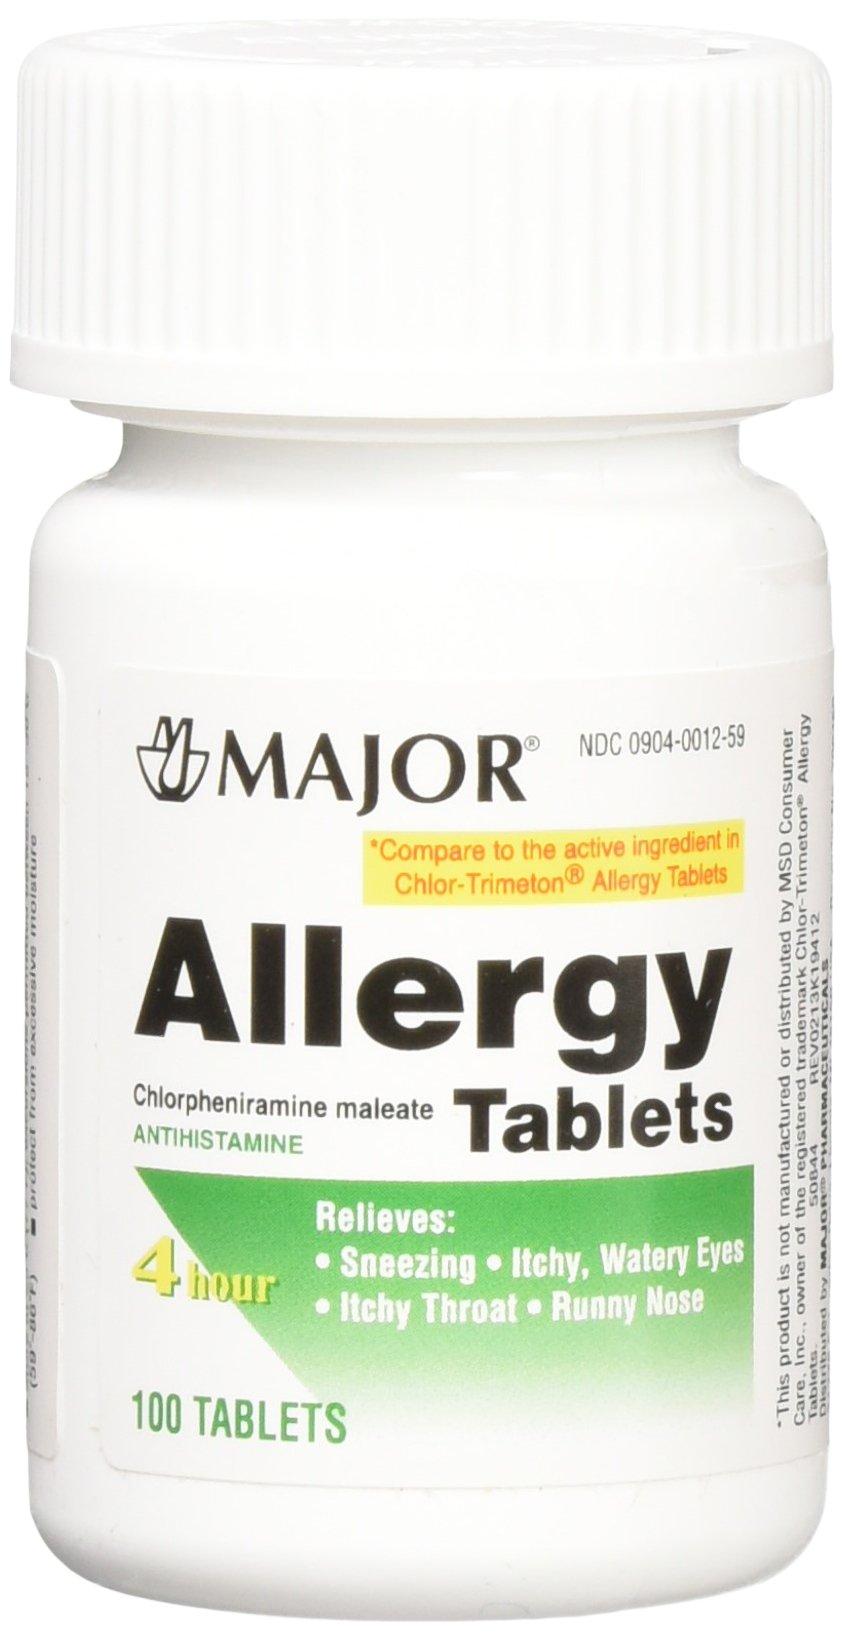 Chlorpheniramine 4mg Tabs - Pet Allergy Relief 100ct